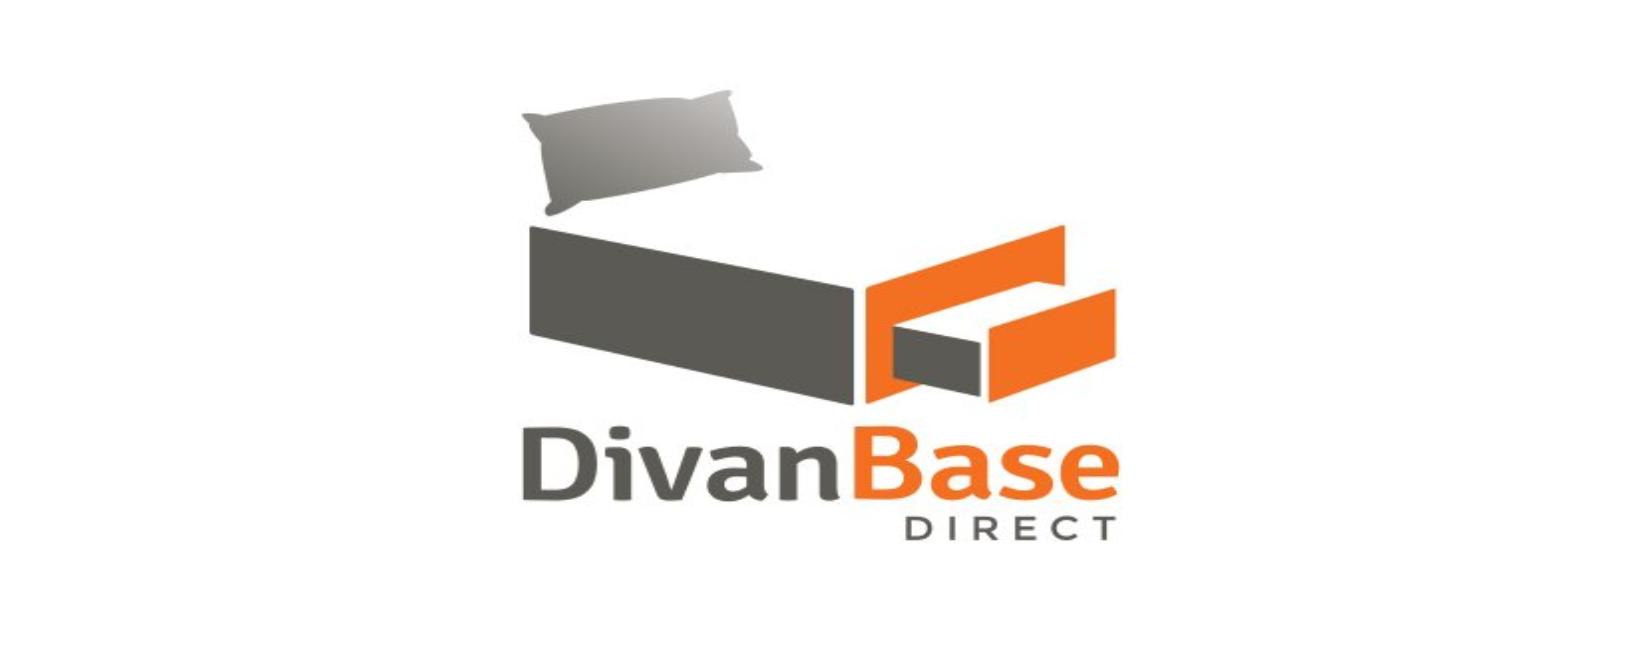 Divan Base Direct Discount Code 2021